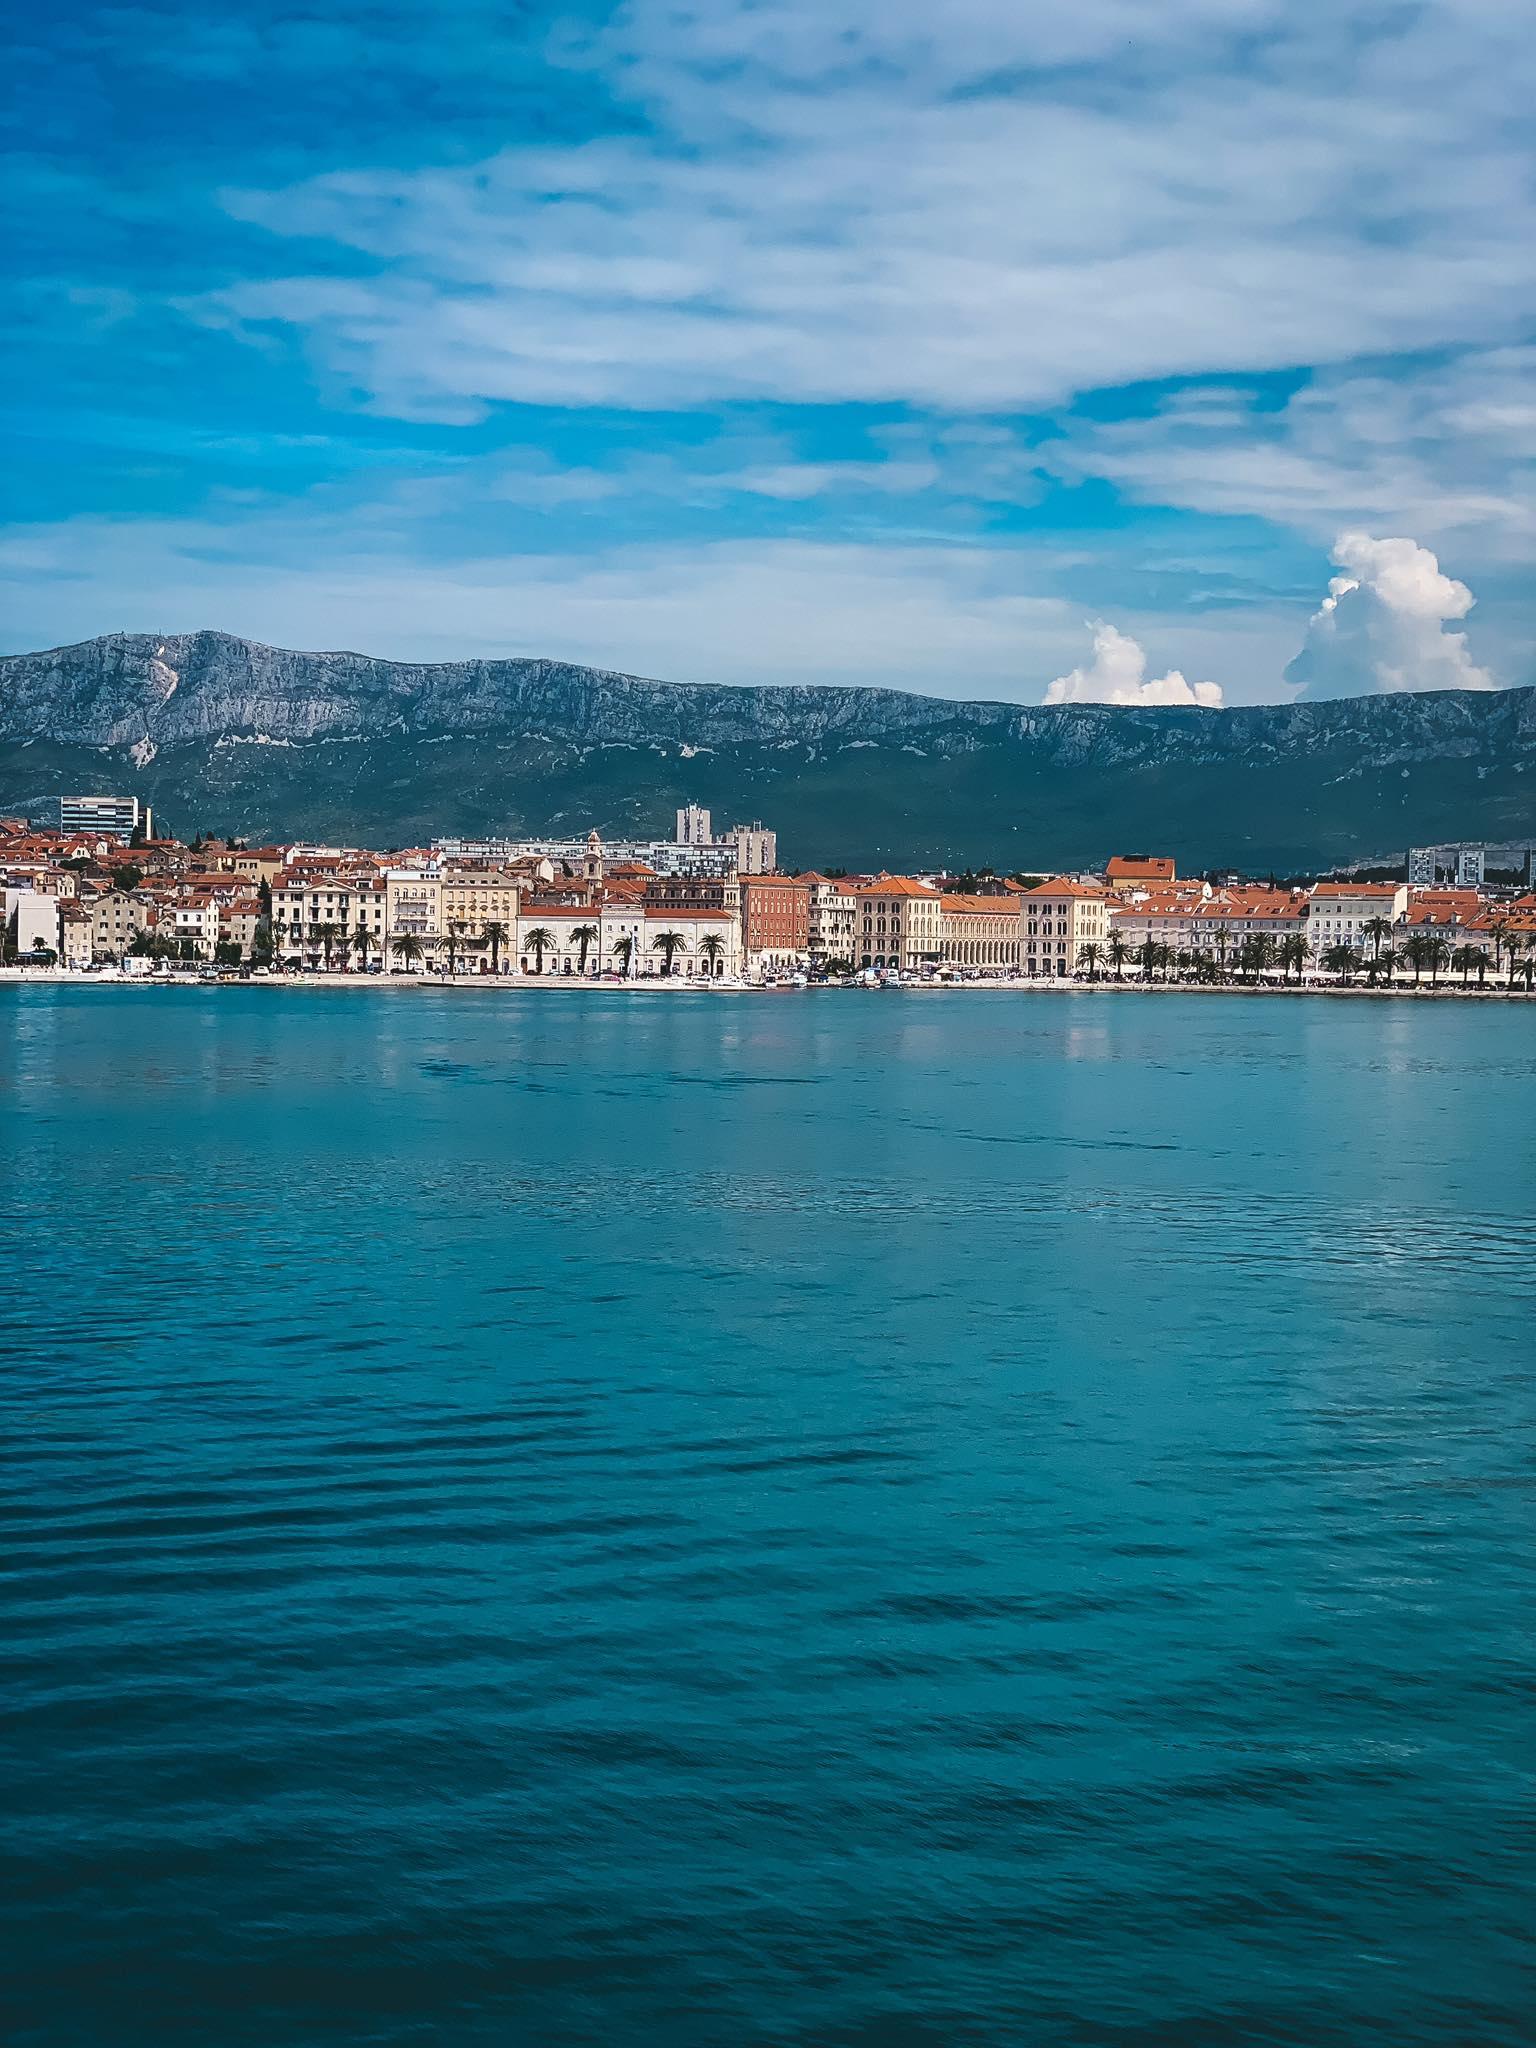 A Travel Guide To Island Brac, Croatia13